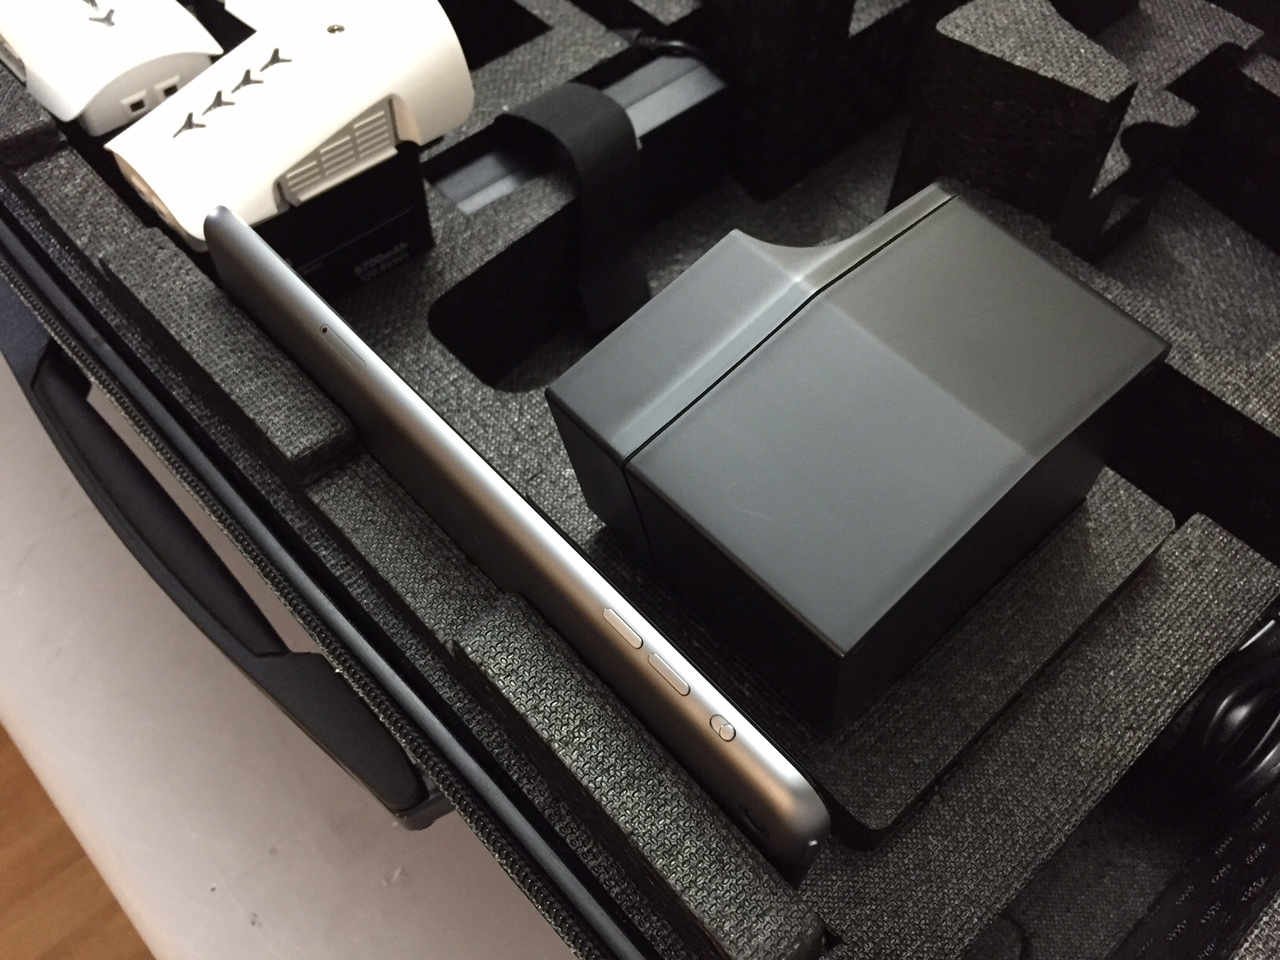 iPad Slot.JPG